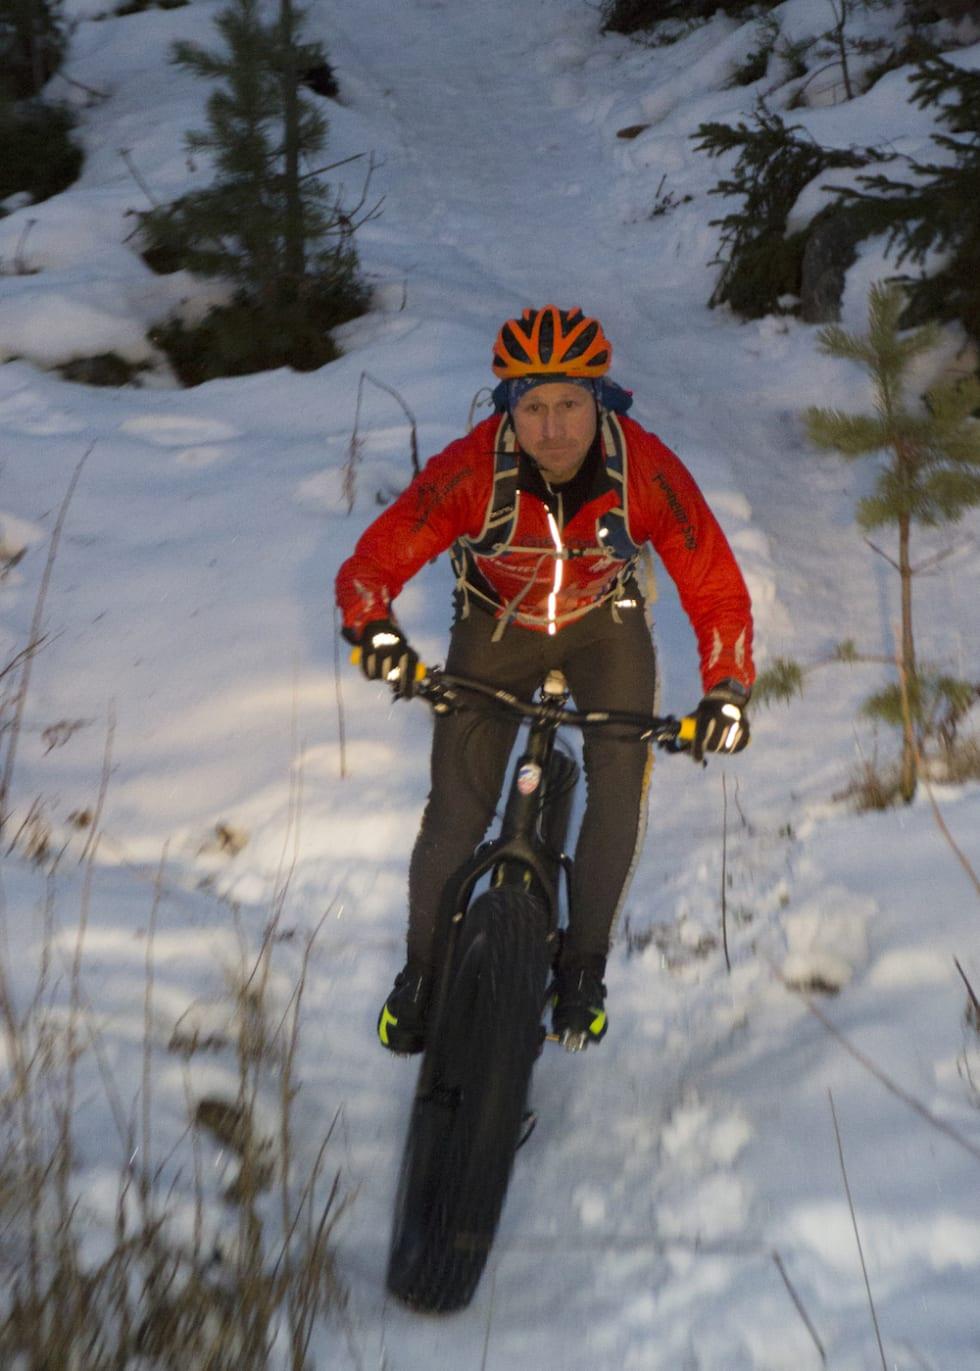 fatbike floafjorden leira-Fredrik Holte Breien - GIMBAL 1000x